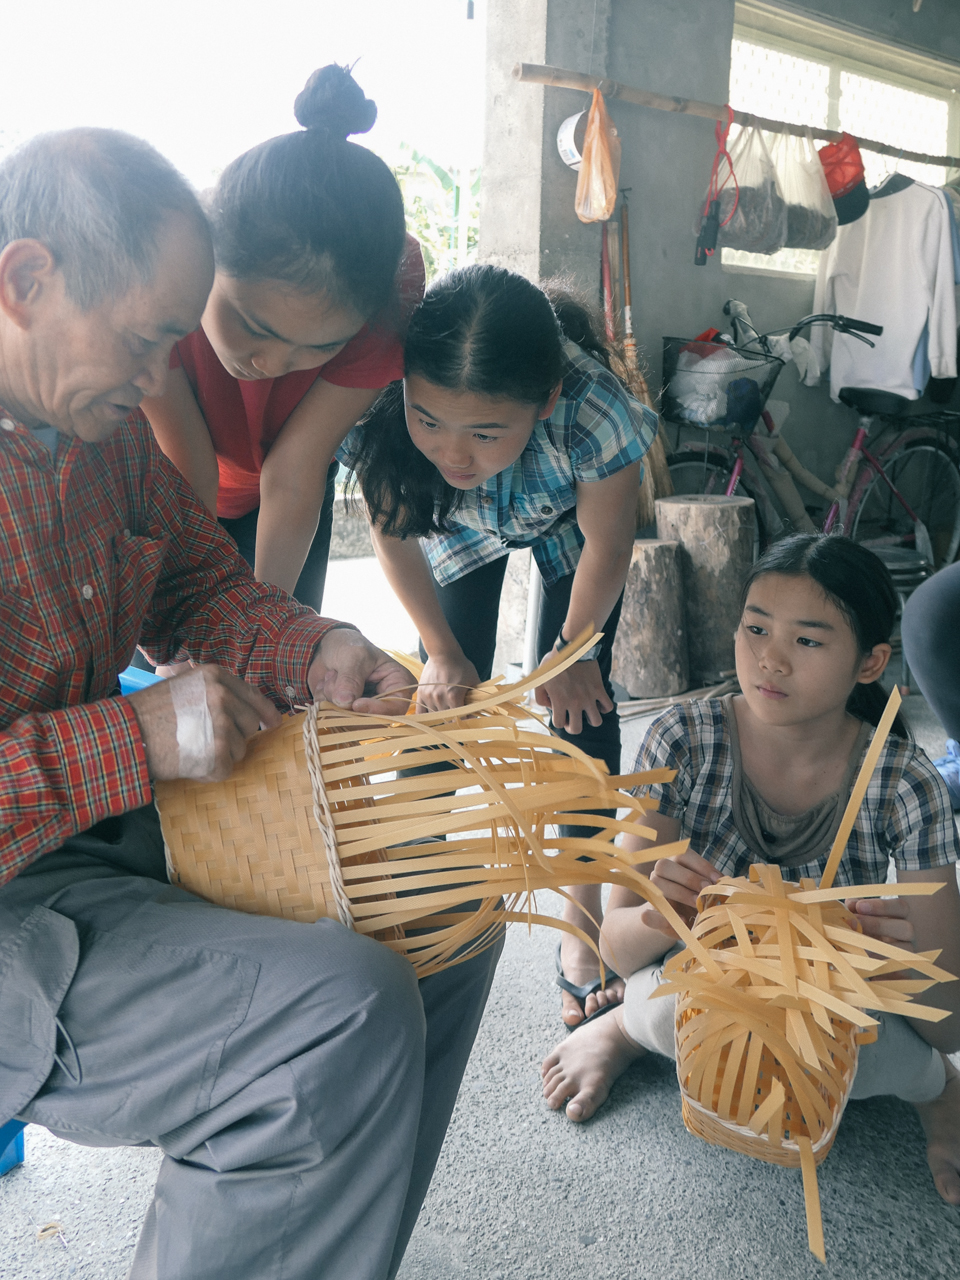 Atomo 16歲、Arigfowang 14歲、Poror 10歲,全族語的與阿公對話每一個細節。